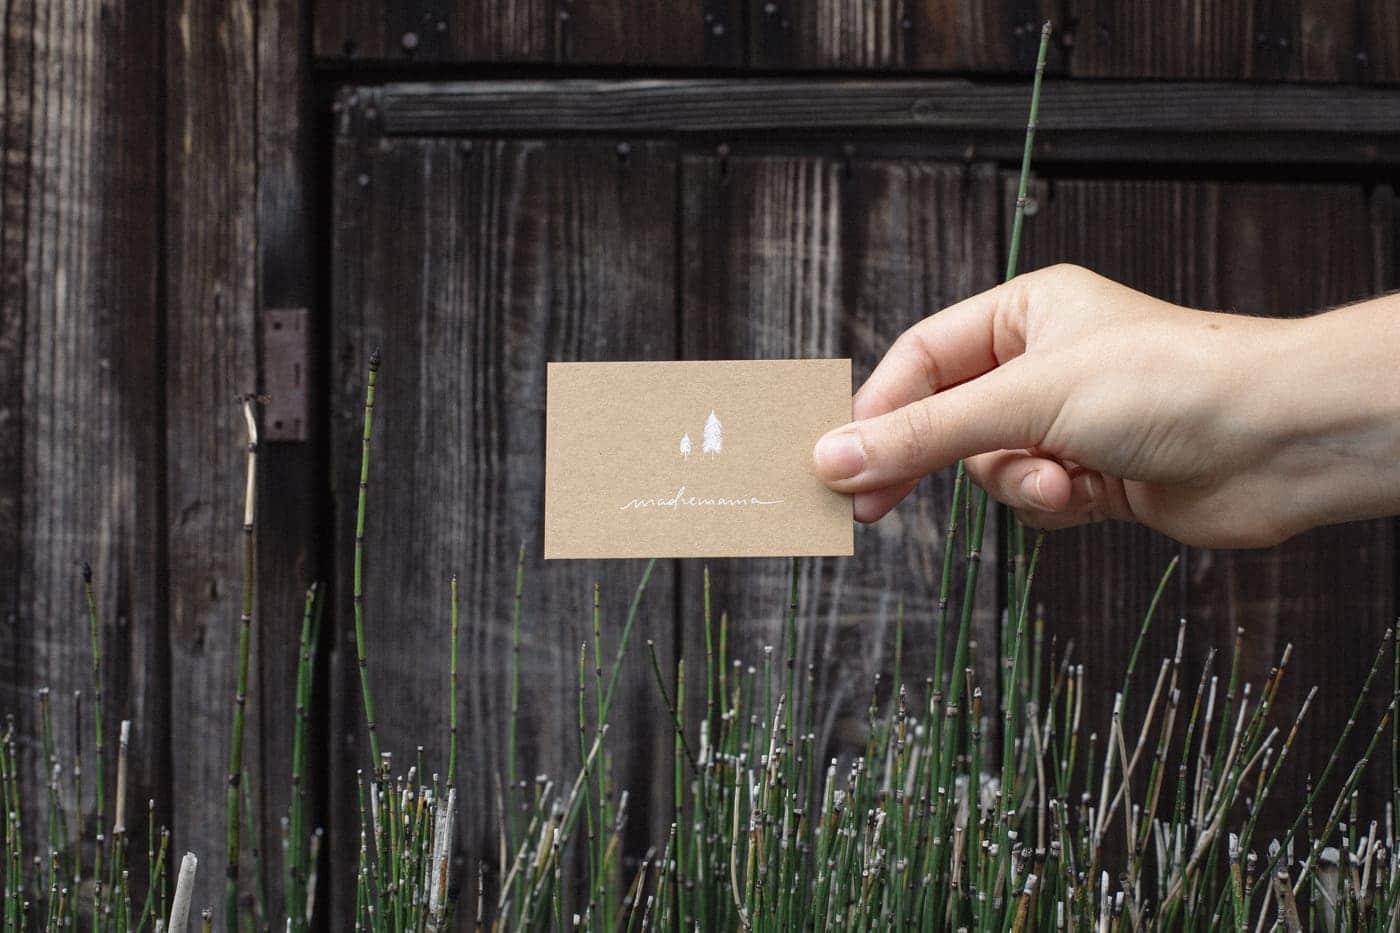 Kinlake-Brand-Identity-Madremania-Business-Cards